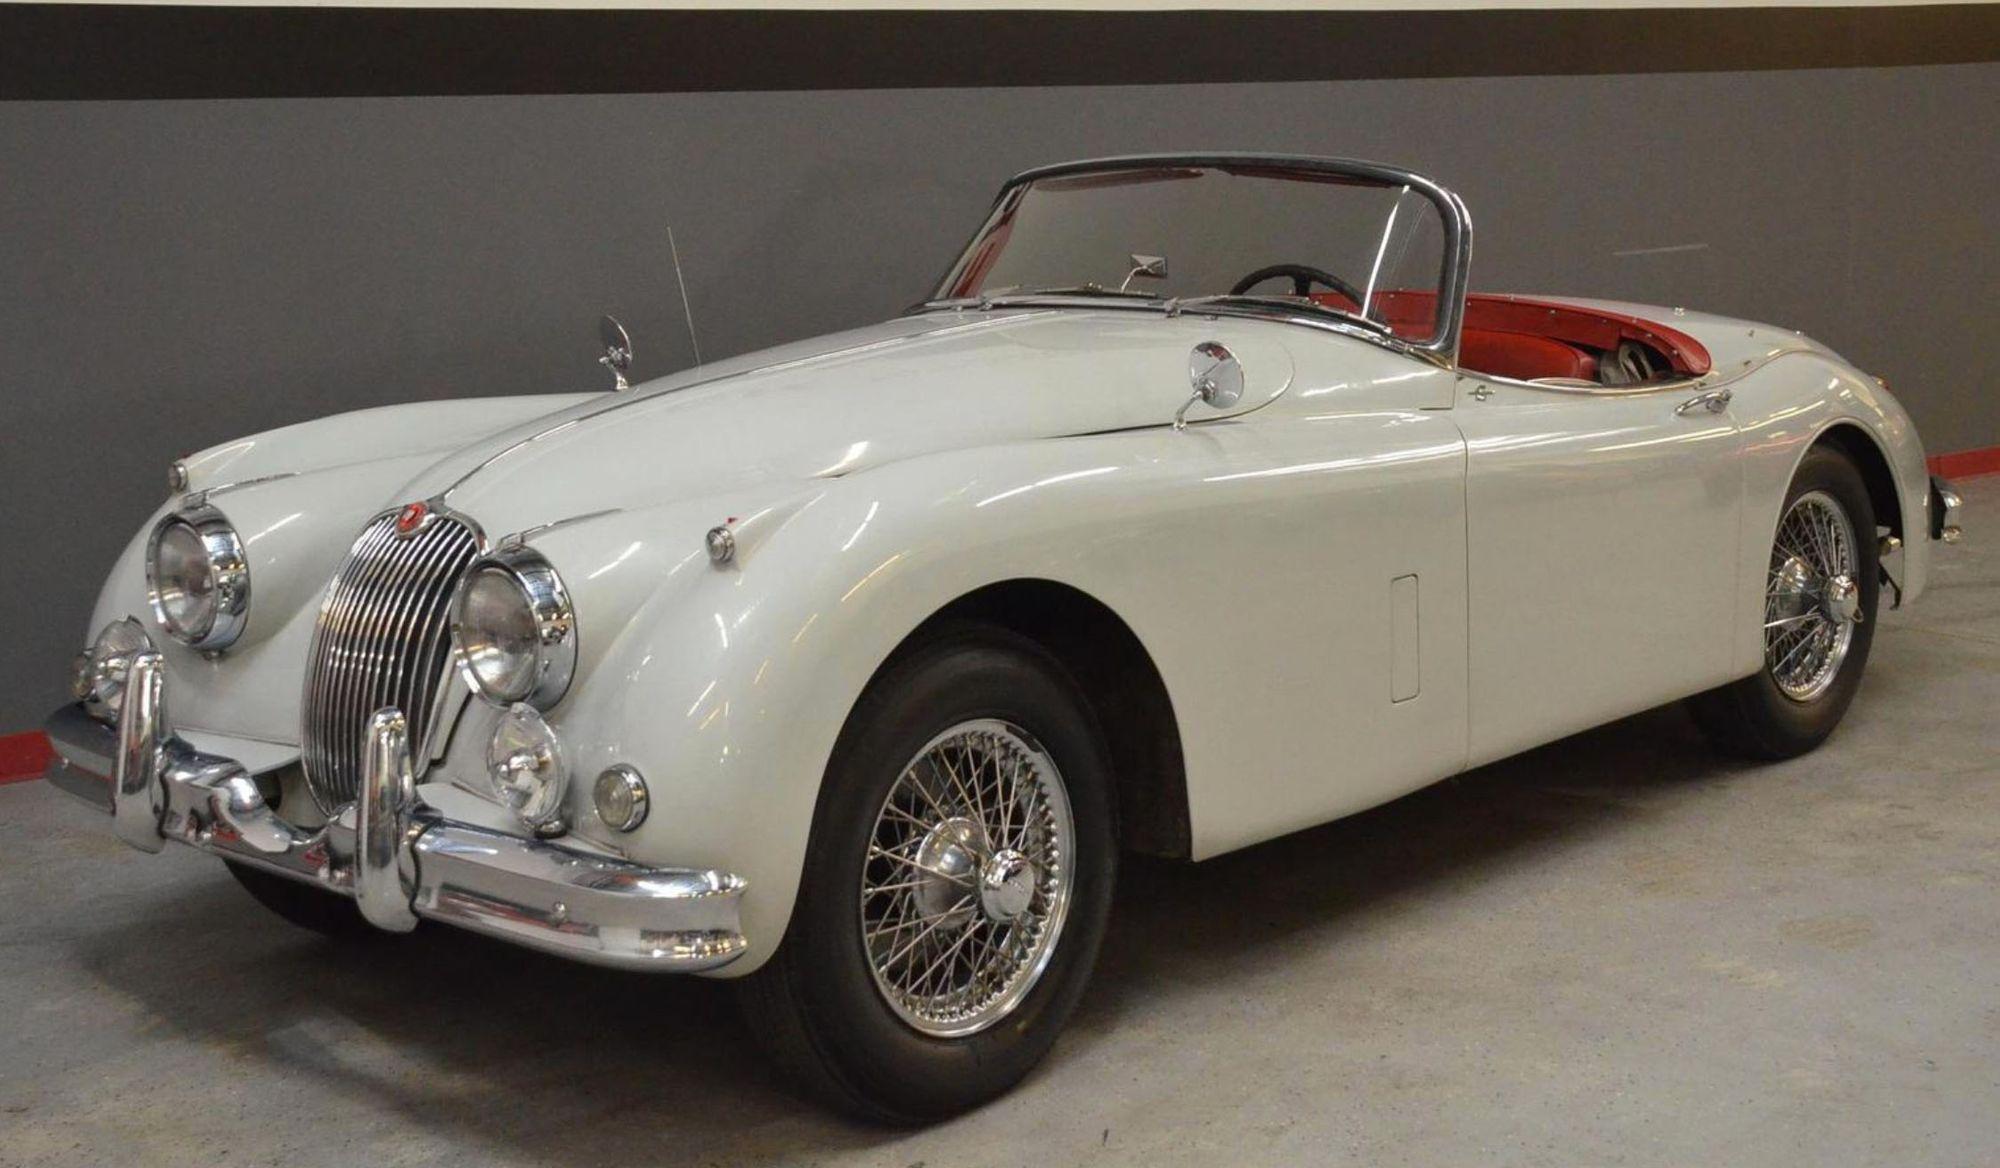 "<img src=""1959-jaguar-xk150-s.jpg"" alt=""A pristine 1959 Jaguar XK150 S up for bids with all proceeds going to chartity"">"